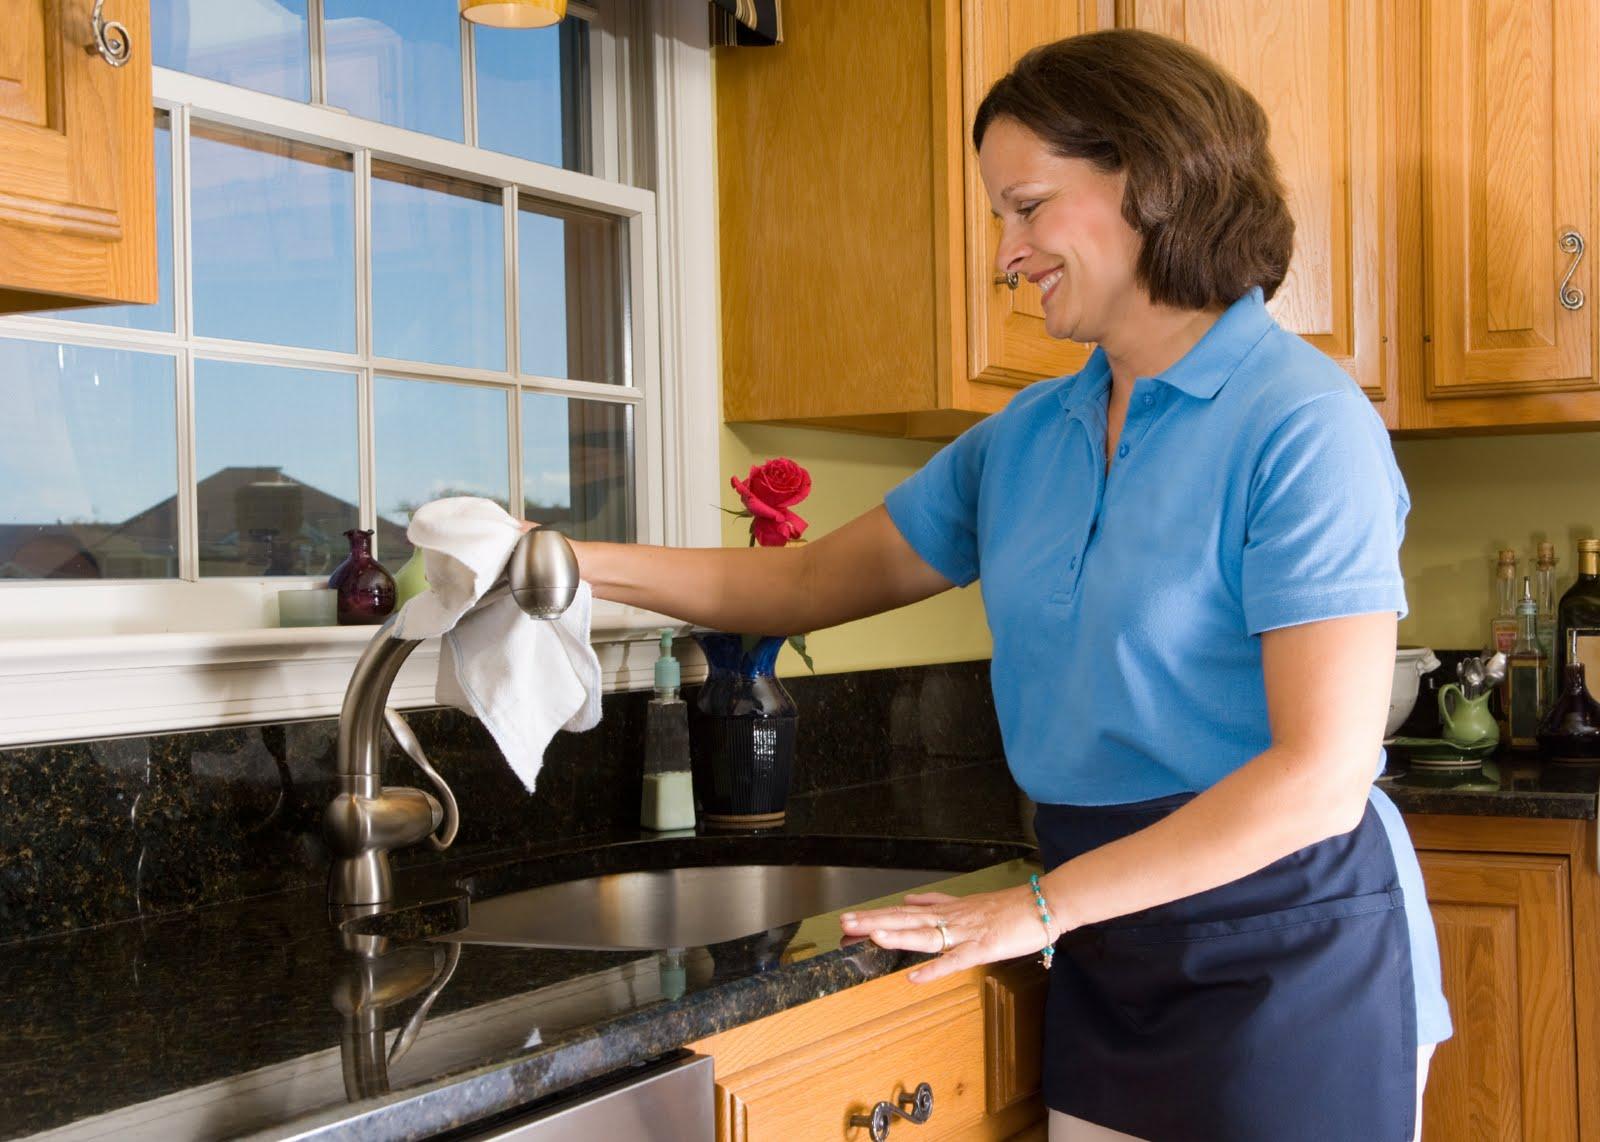 A Woman Wipes The Kitchen Faucet - Domestic Assistance Services - ESP Healthcare